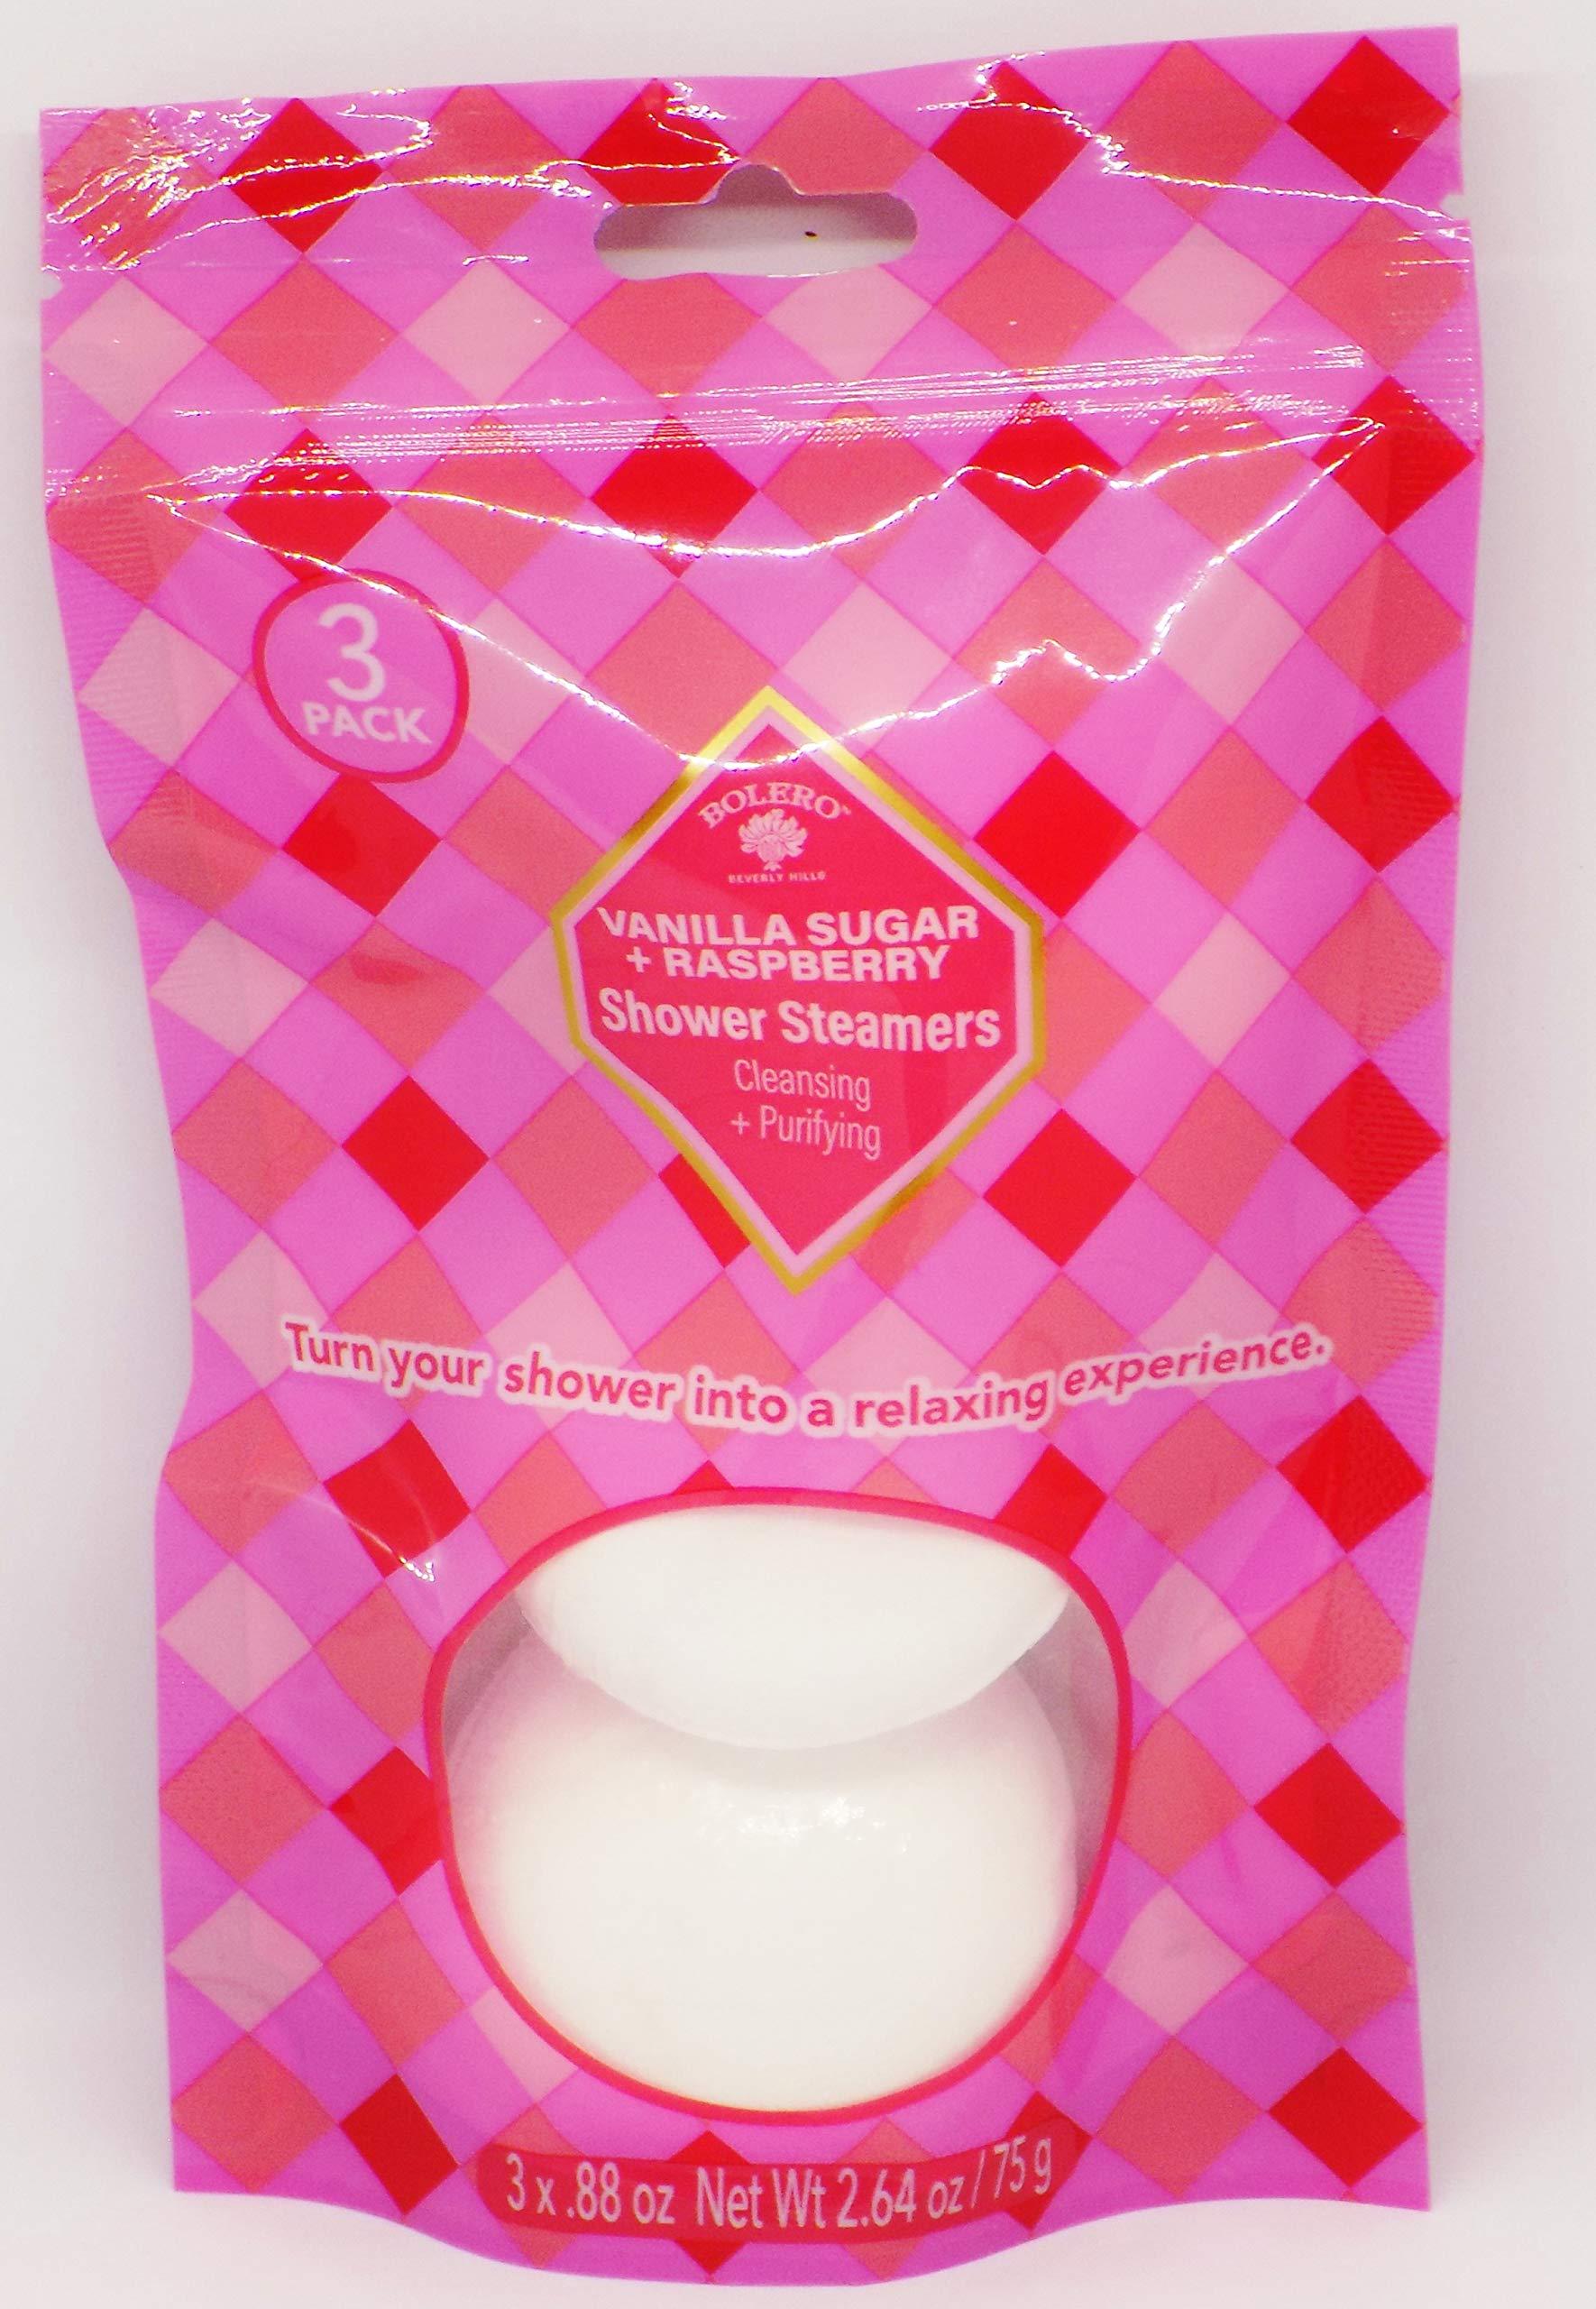 amazon.com Bolero Vanilla Sugar & Raspberry Shower Steamers